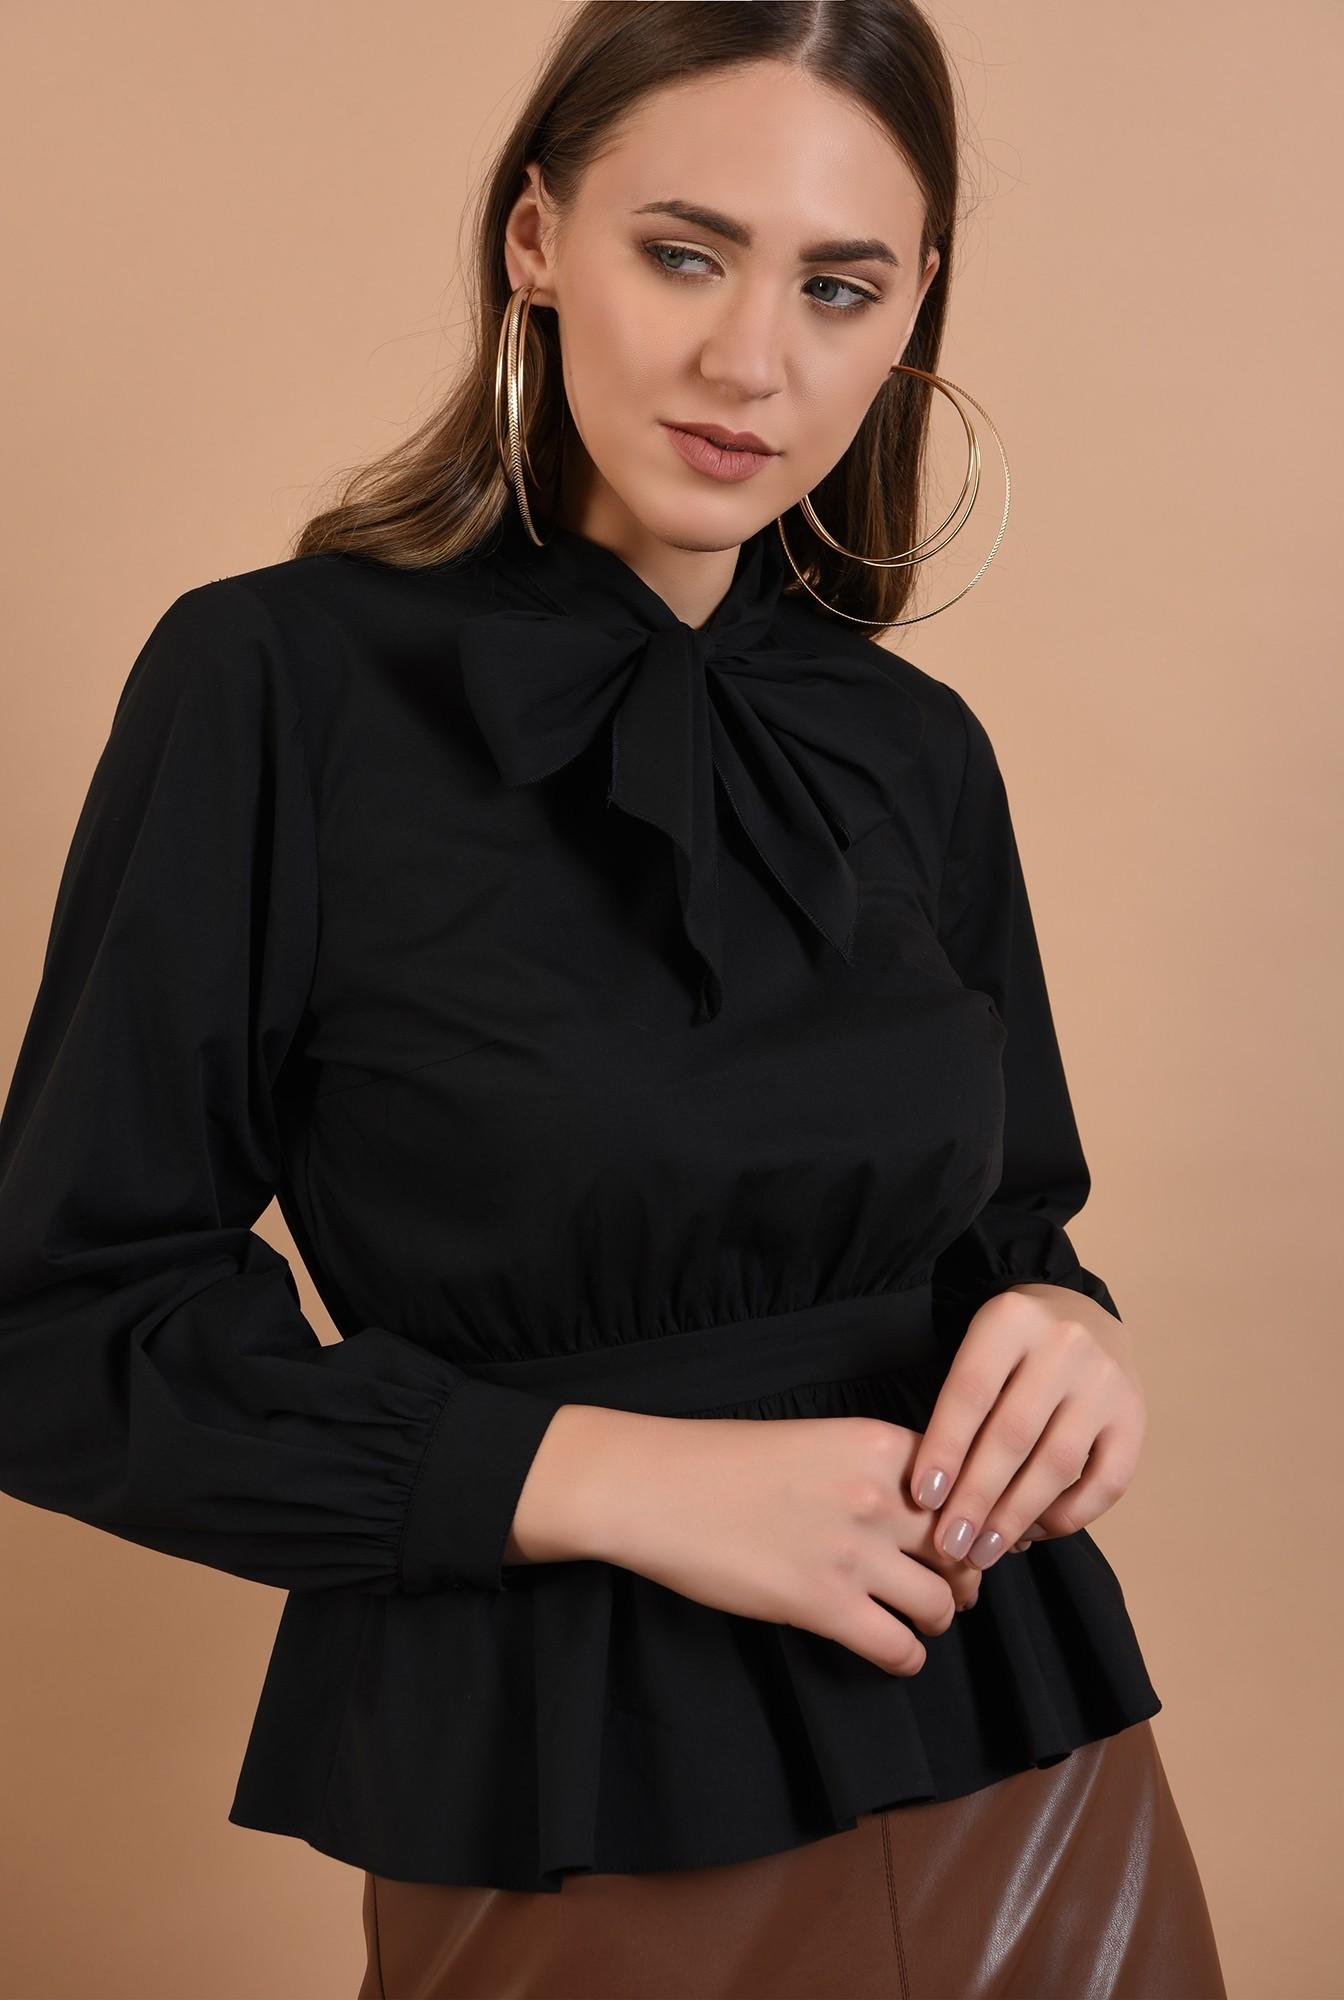 2 - bluza din poplin, funda la gat, maneci cu manseta, neagra